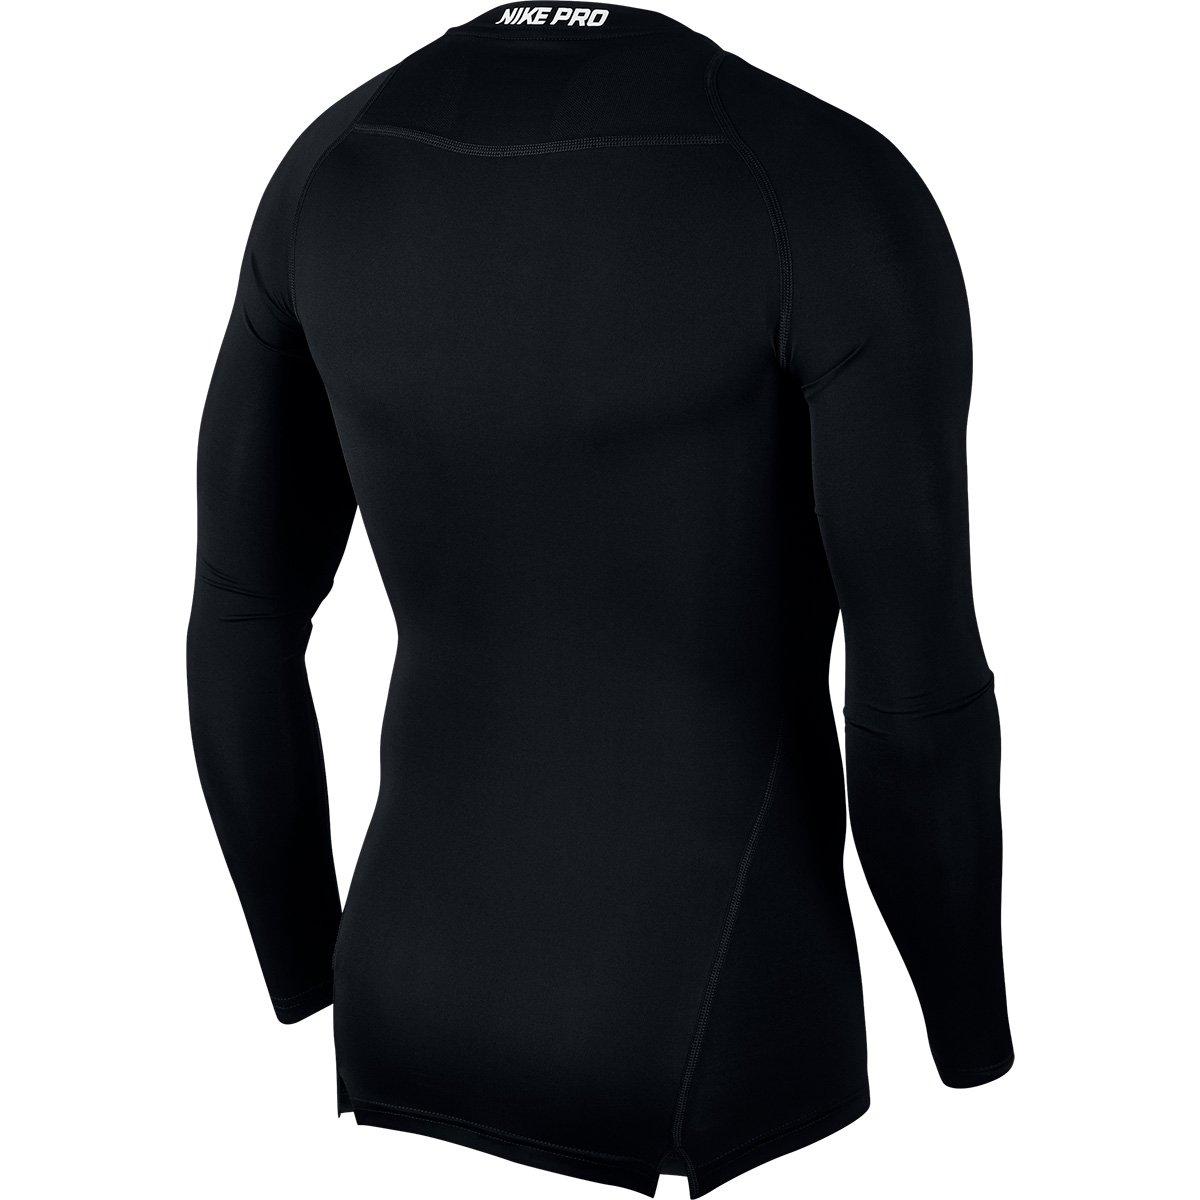 6dcdfa1158a3ab  Camiseta Compressão Nike Pro Manga Longa Masculina Livelo  -Sua . 206d6e8d4081c